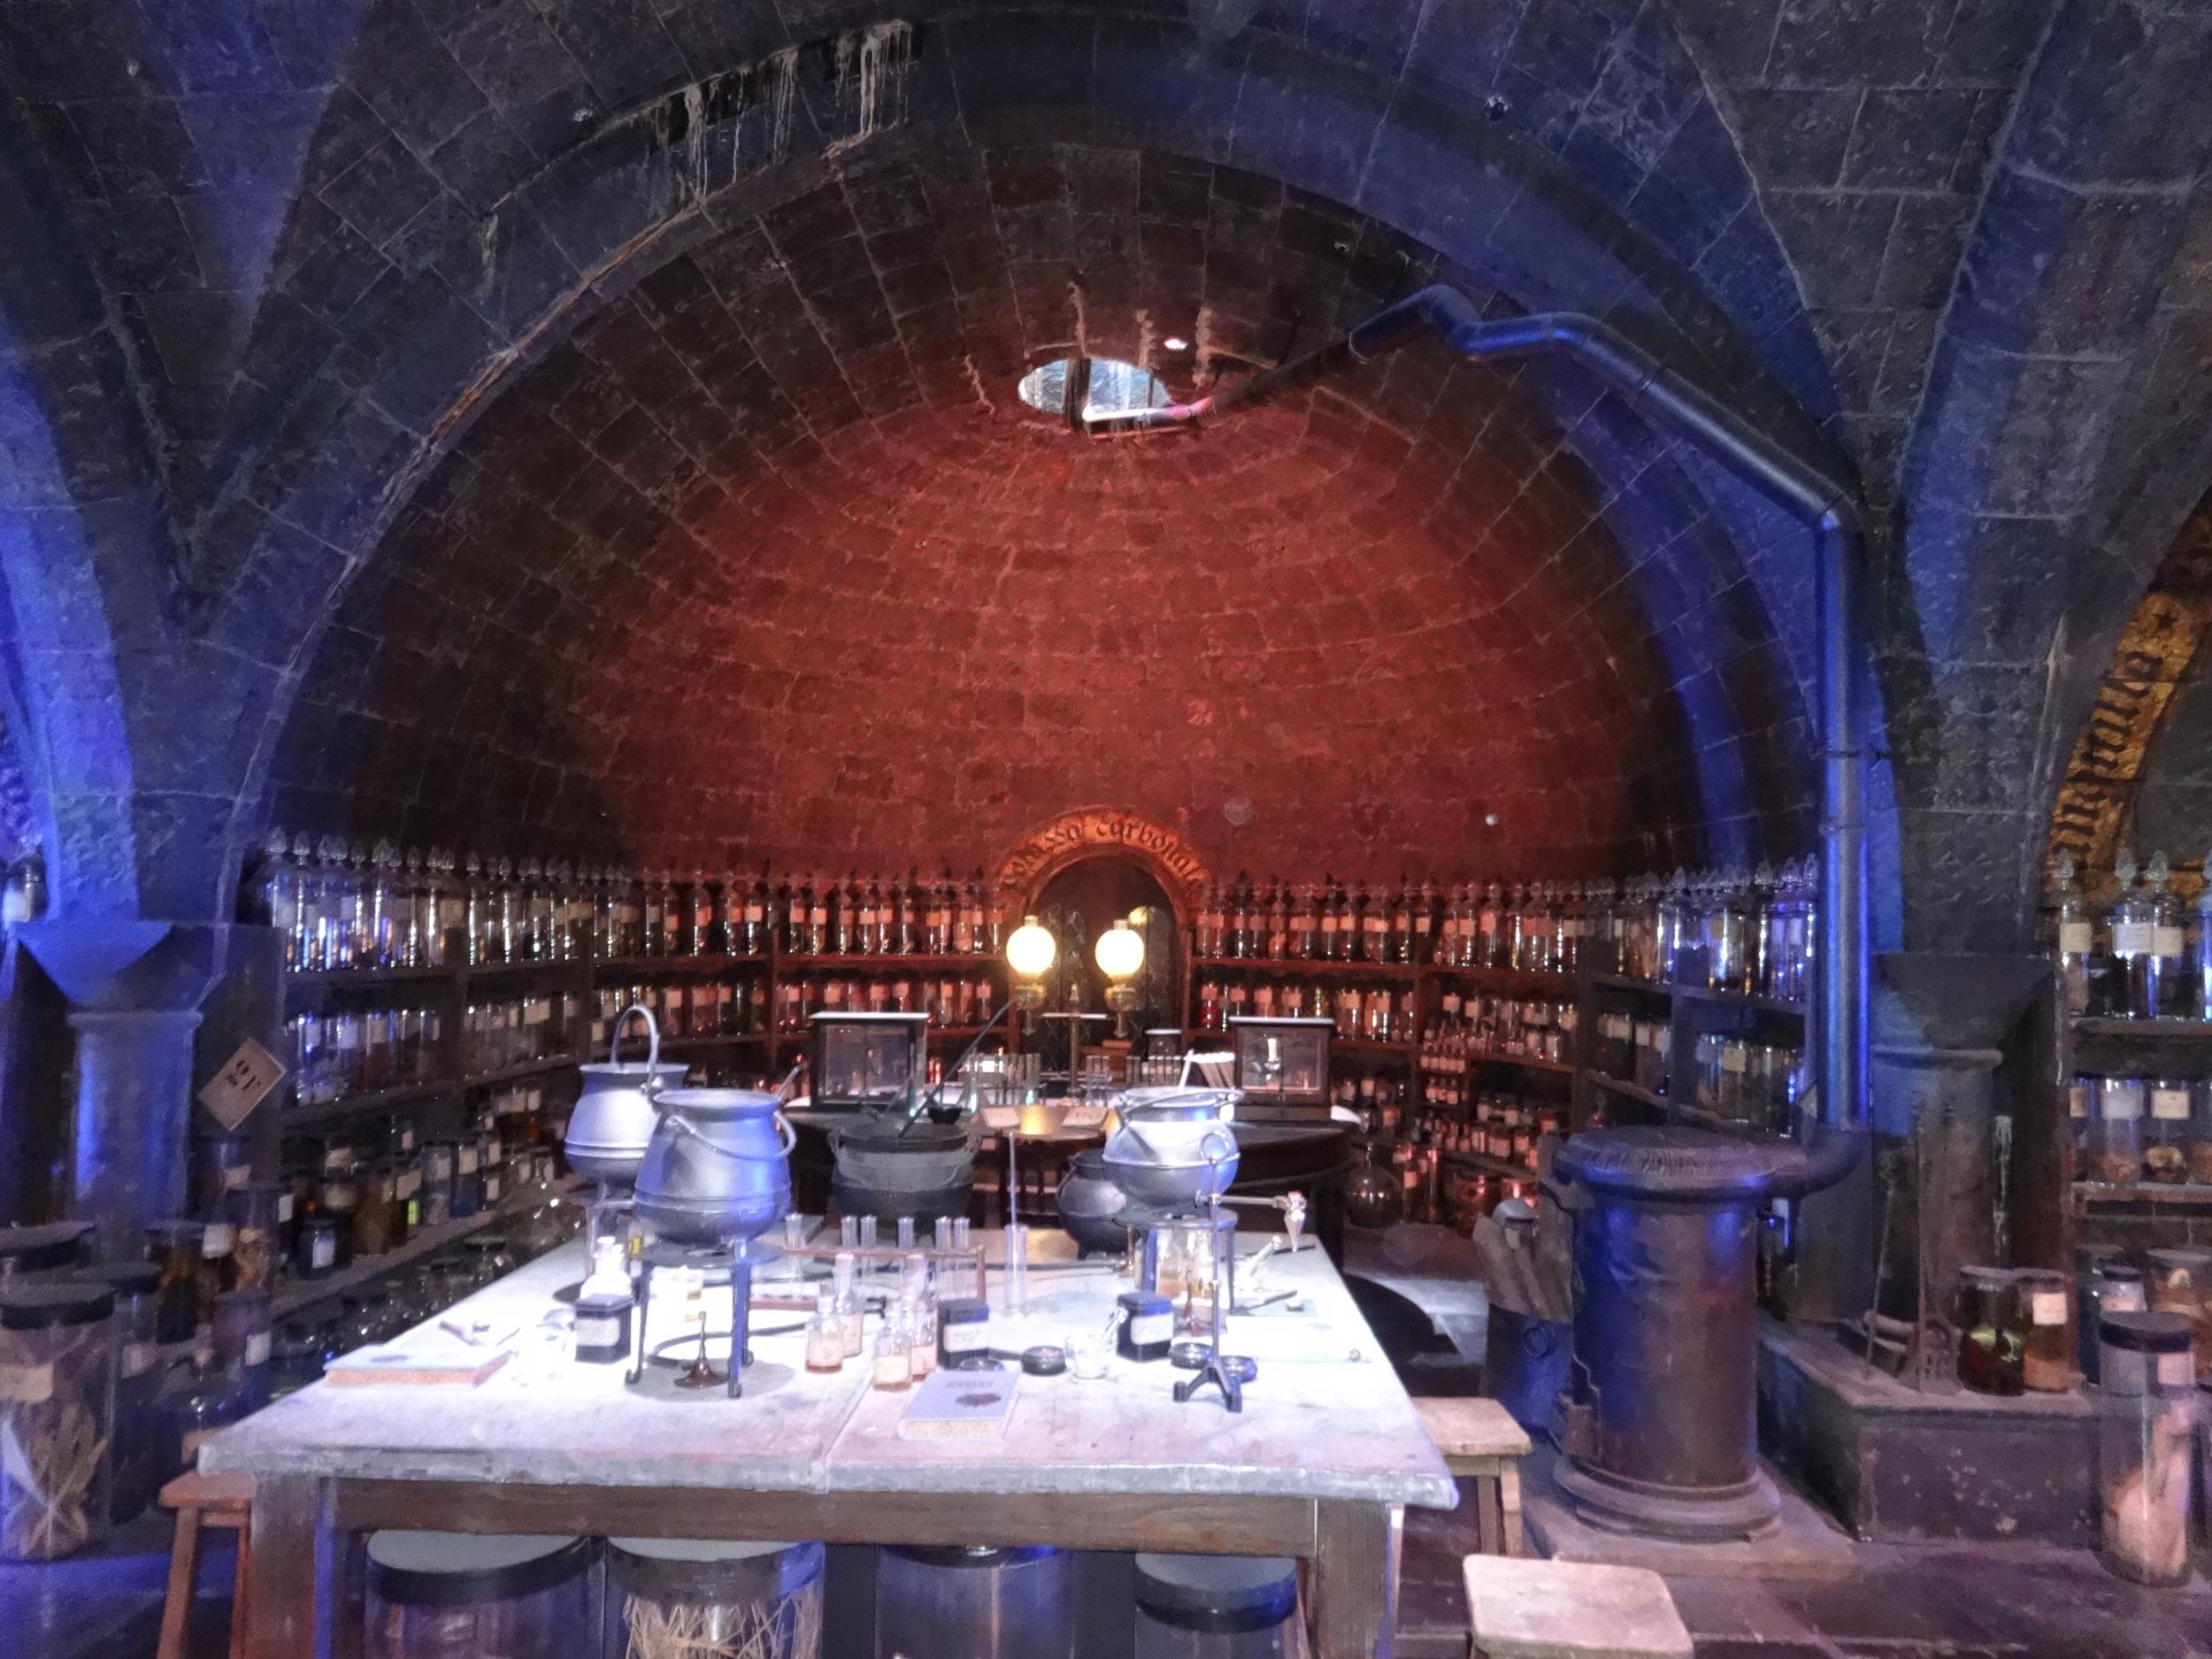 Potion's classroom